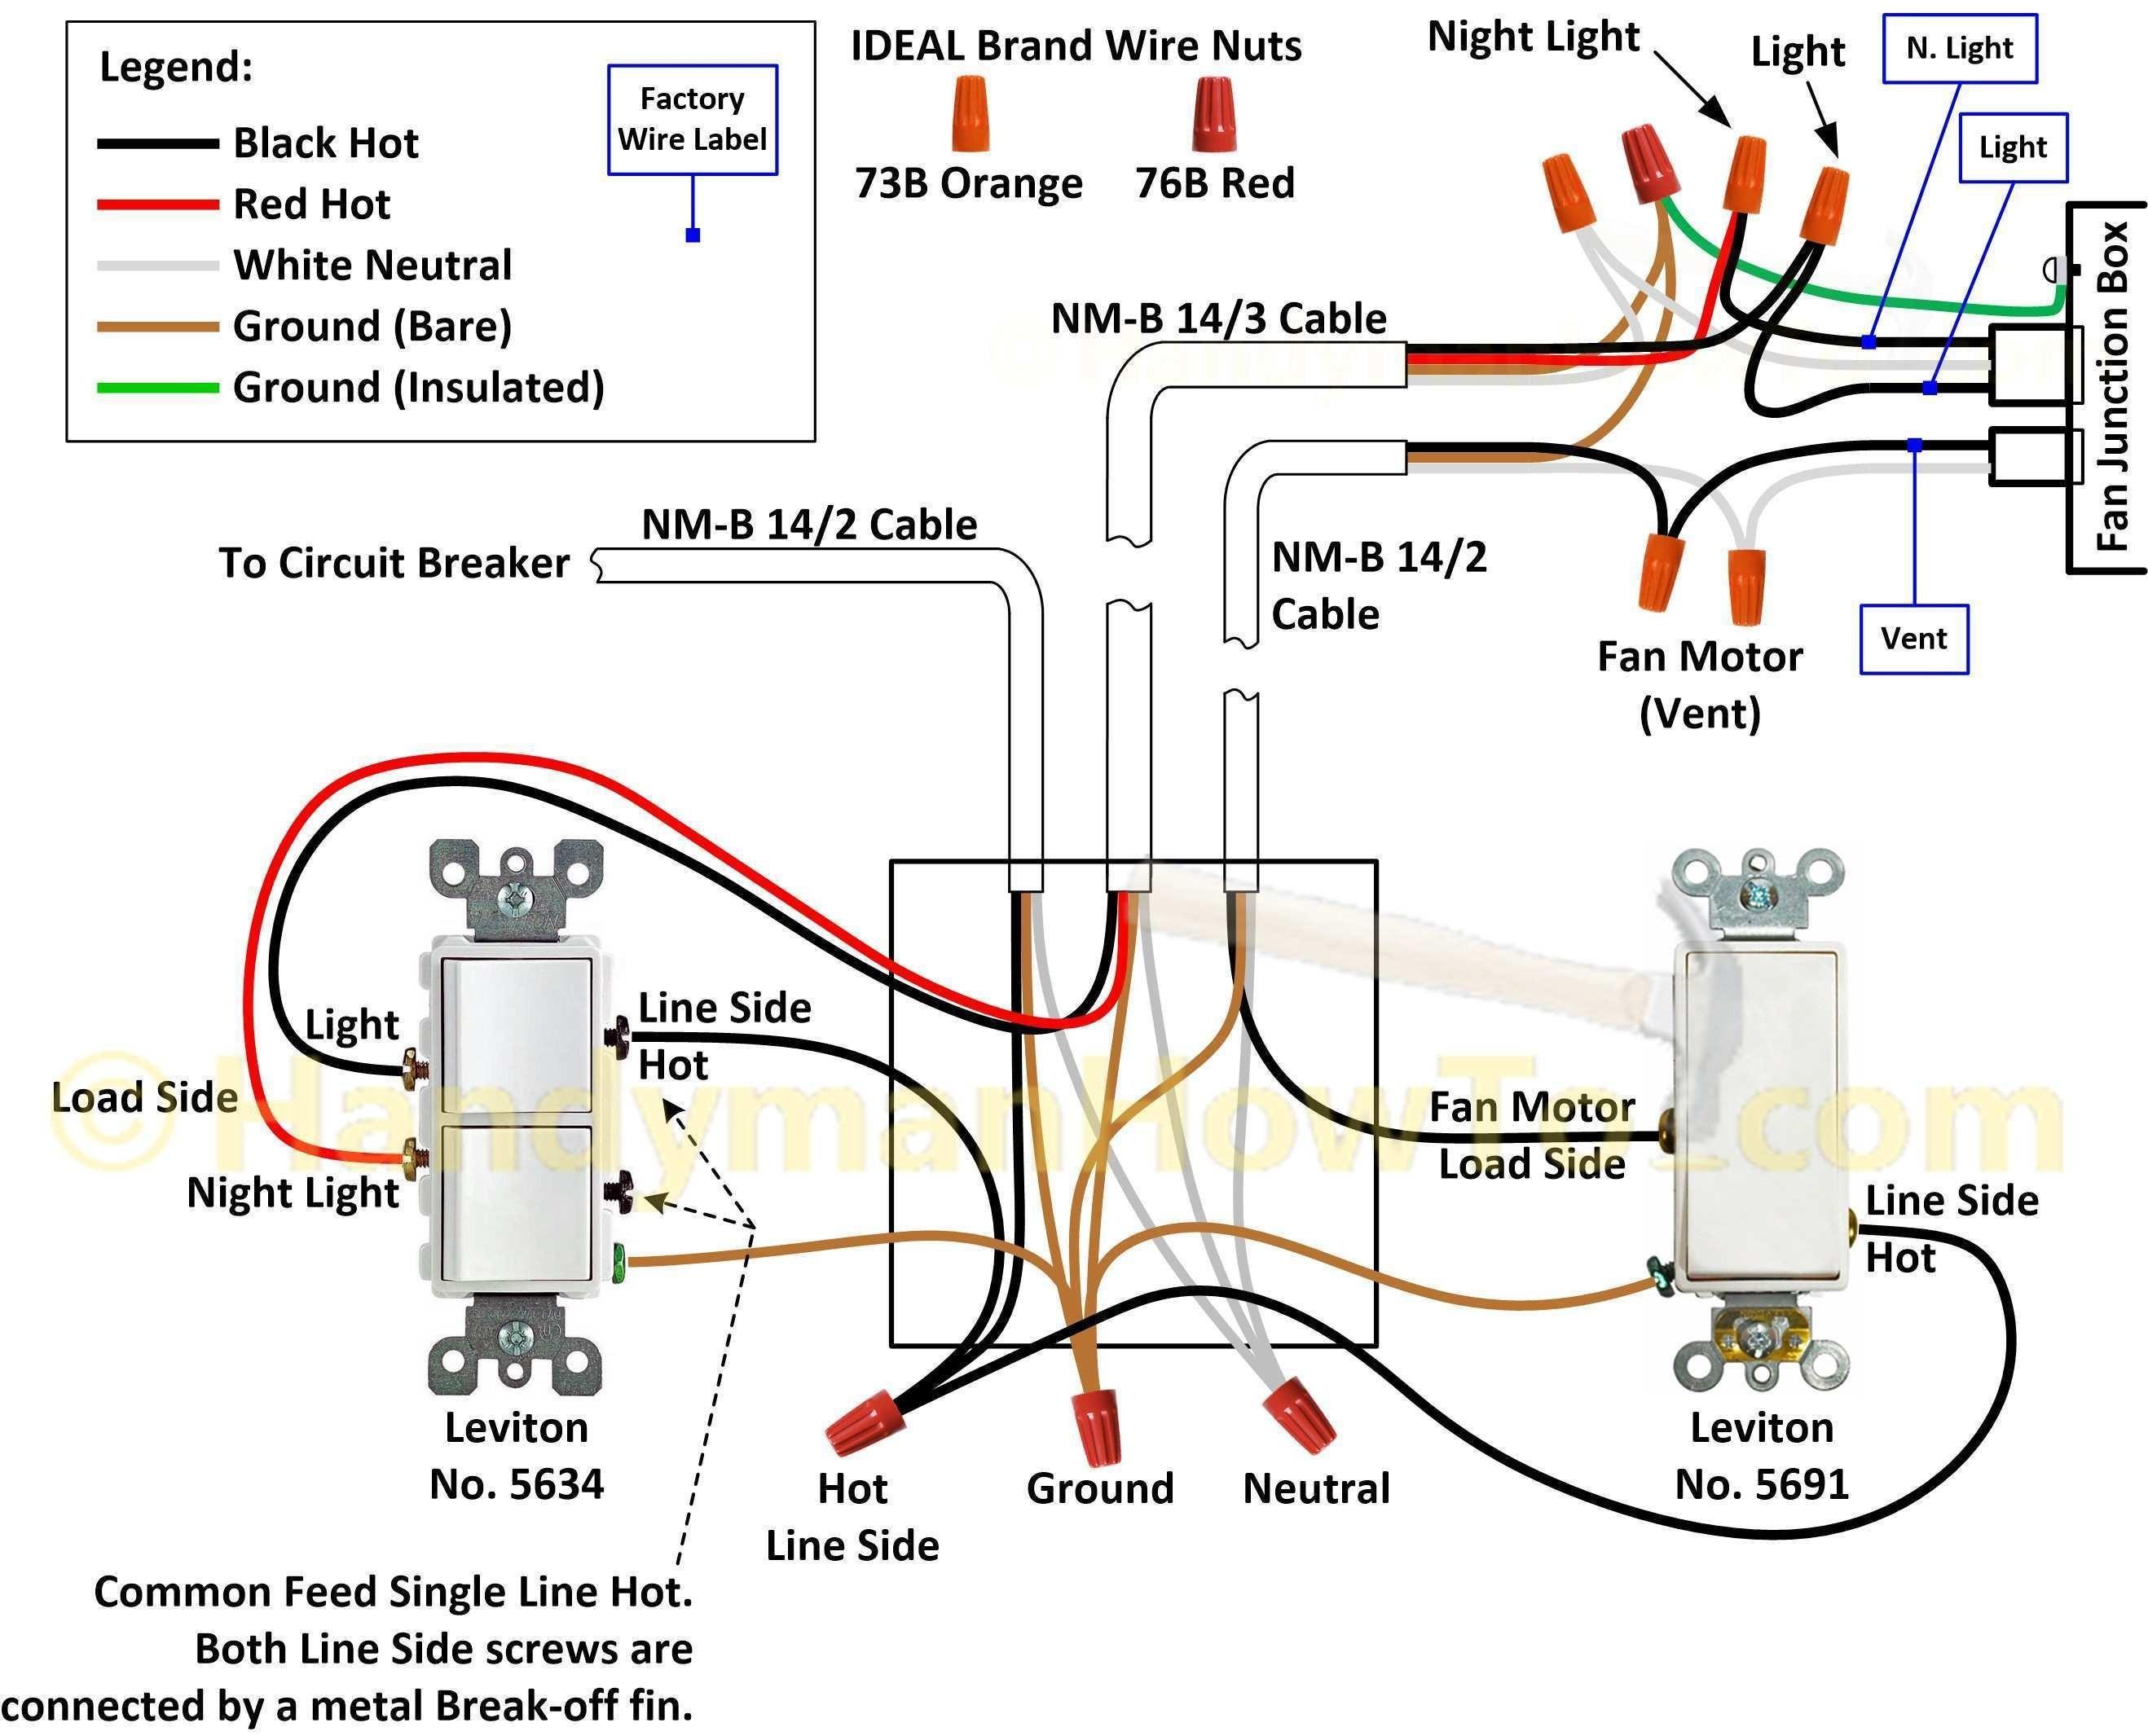 evaporative cooler motor wiring diagram sm 1368  thermostat swamp cooler wiring diagram free download  thermostat swamp cooler wiring diagram